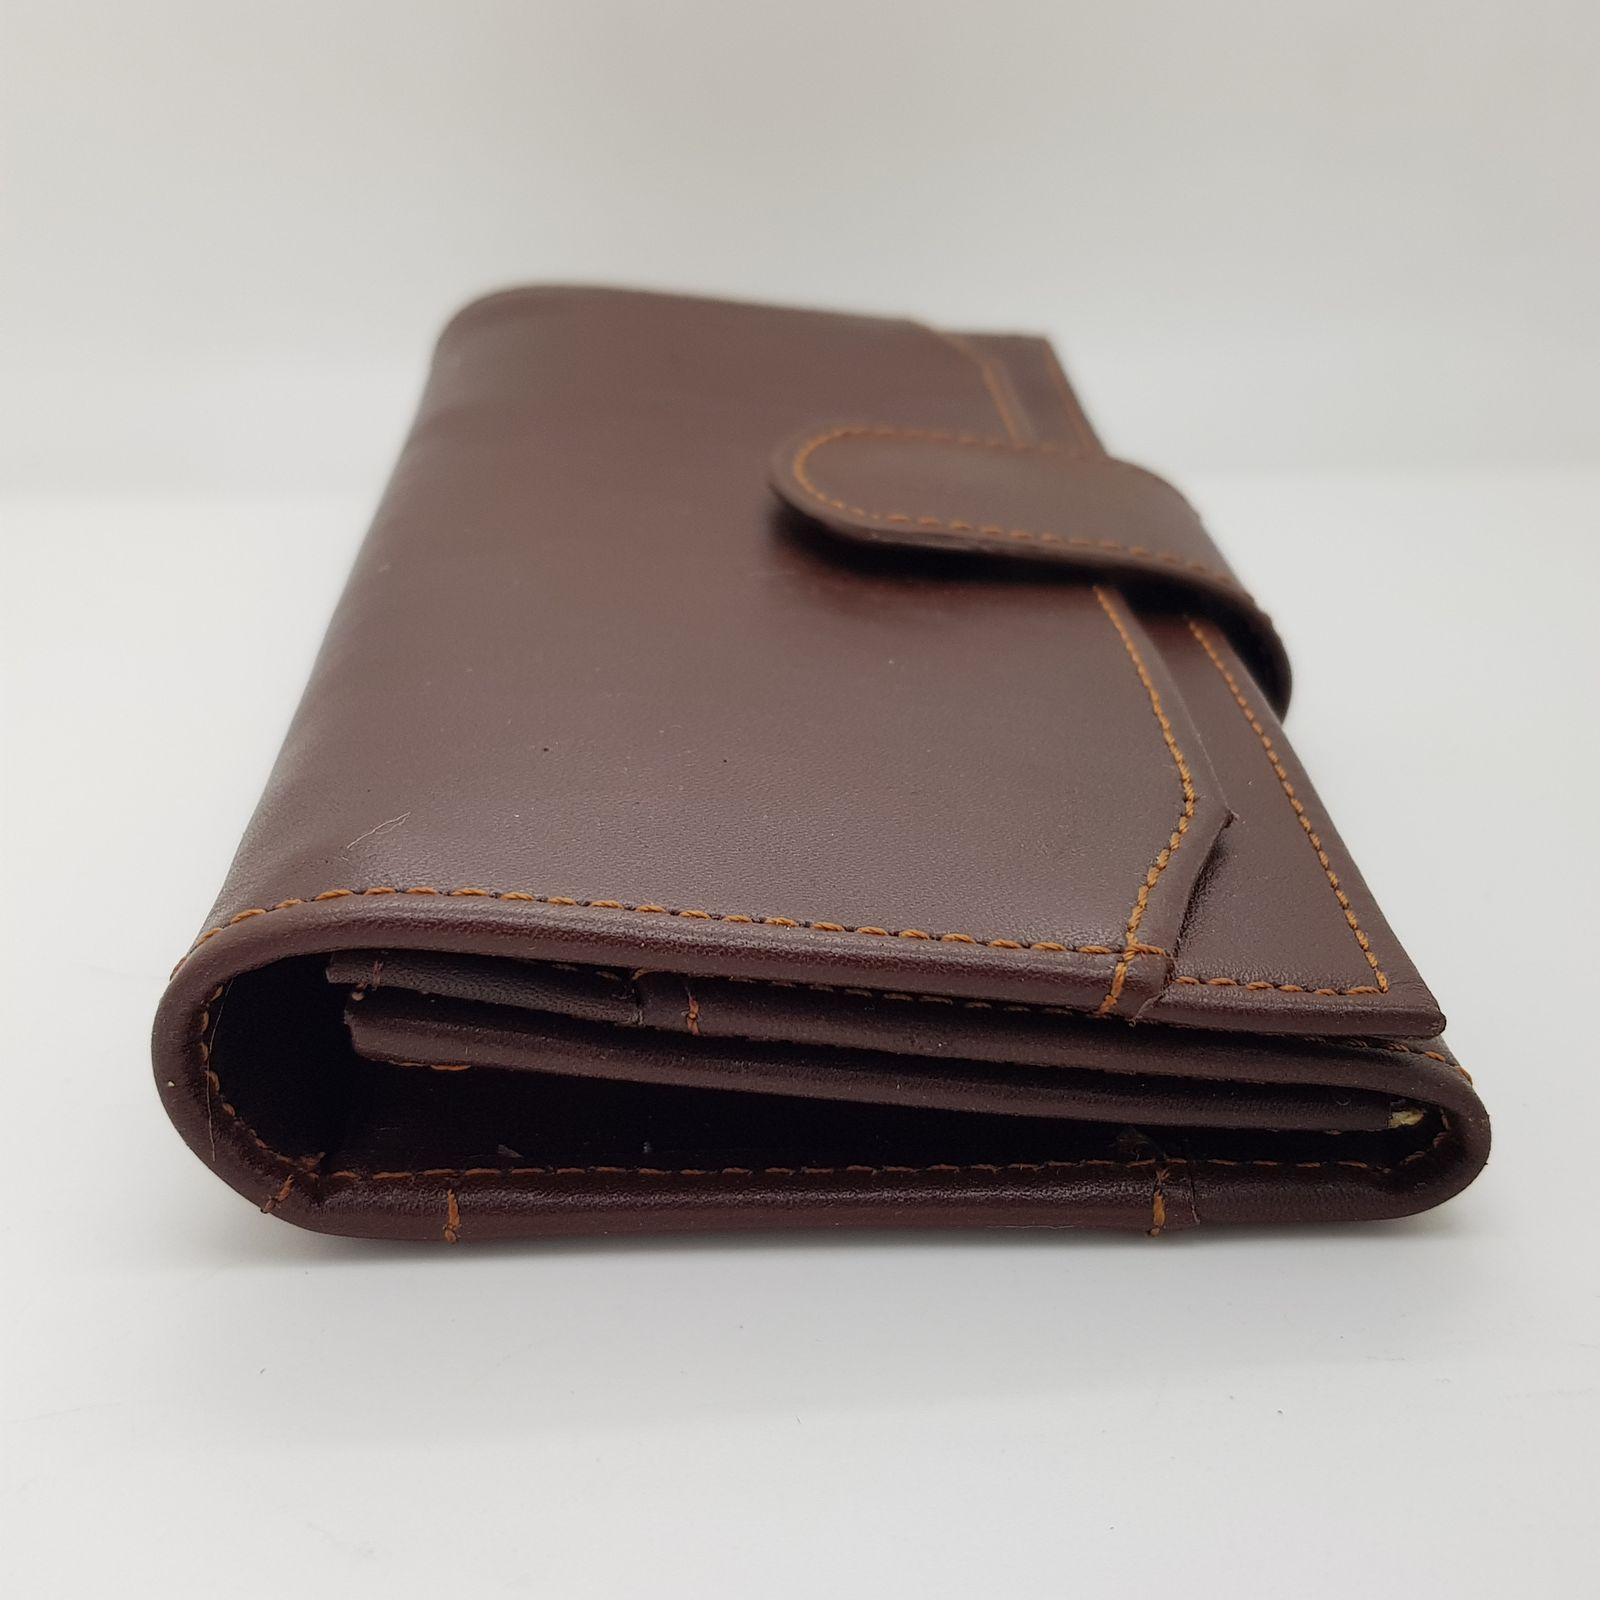 کیف پول زنانه چرم دیاکو مدل 315 -  - 16